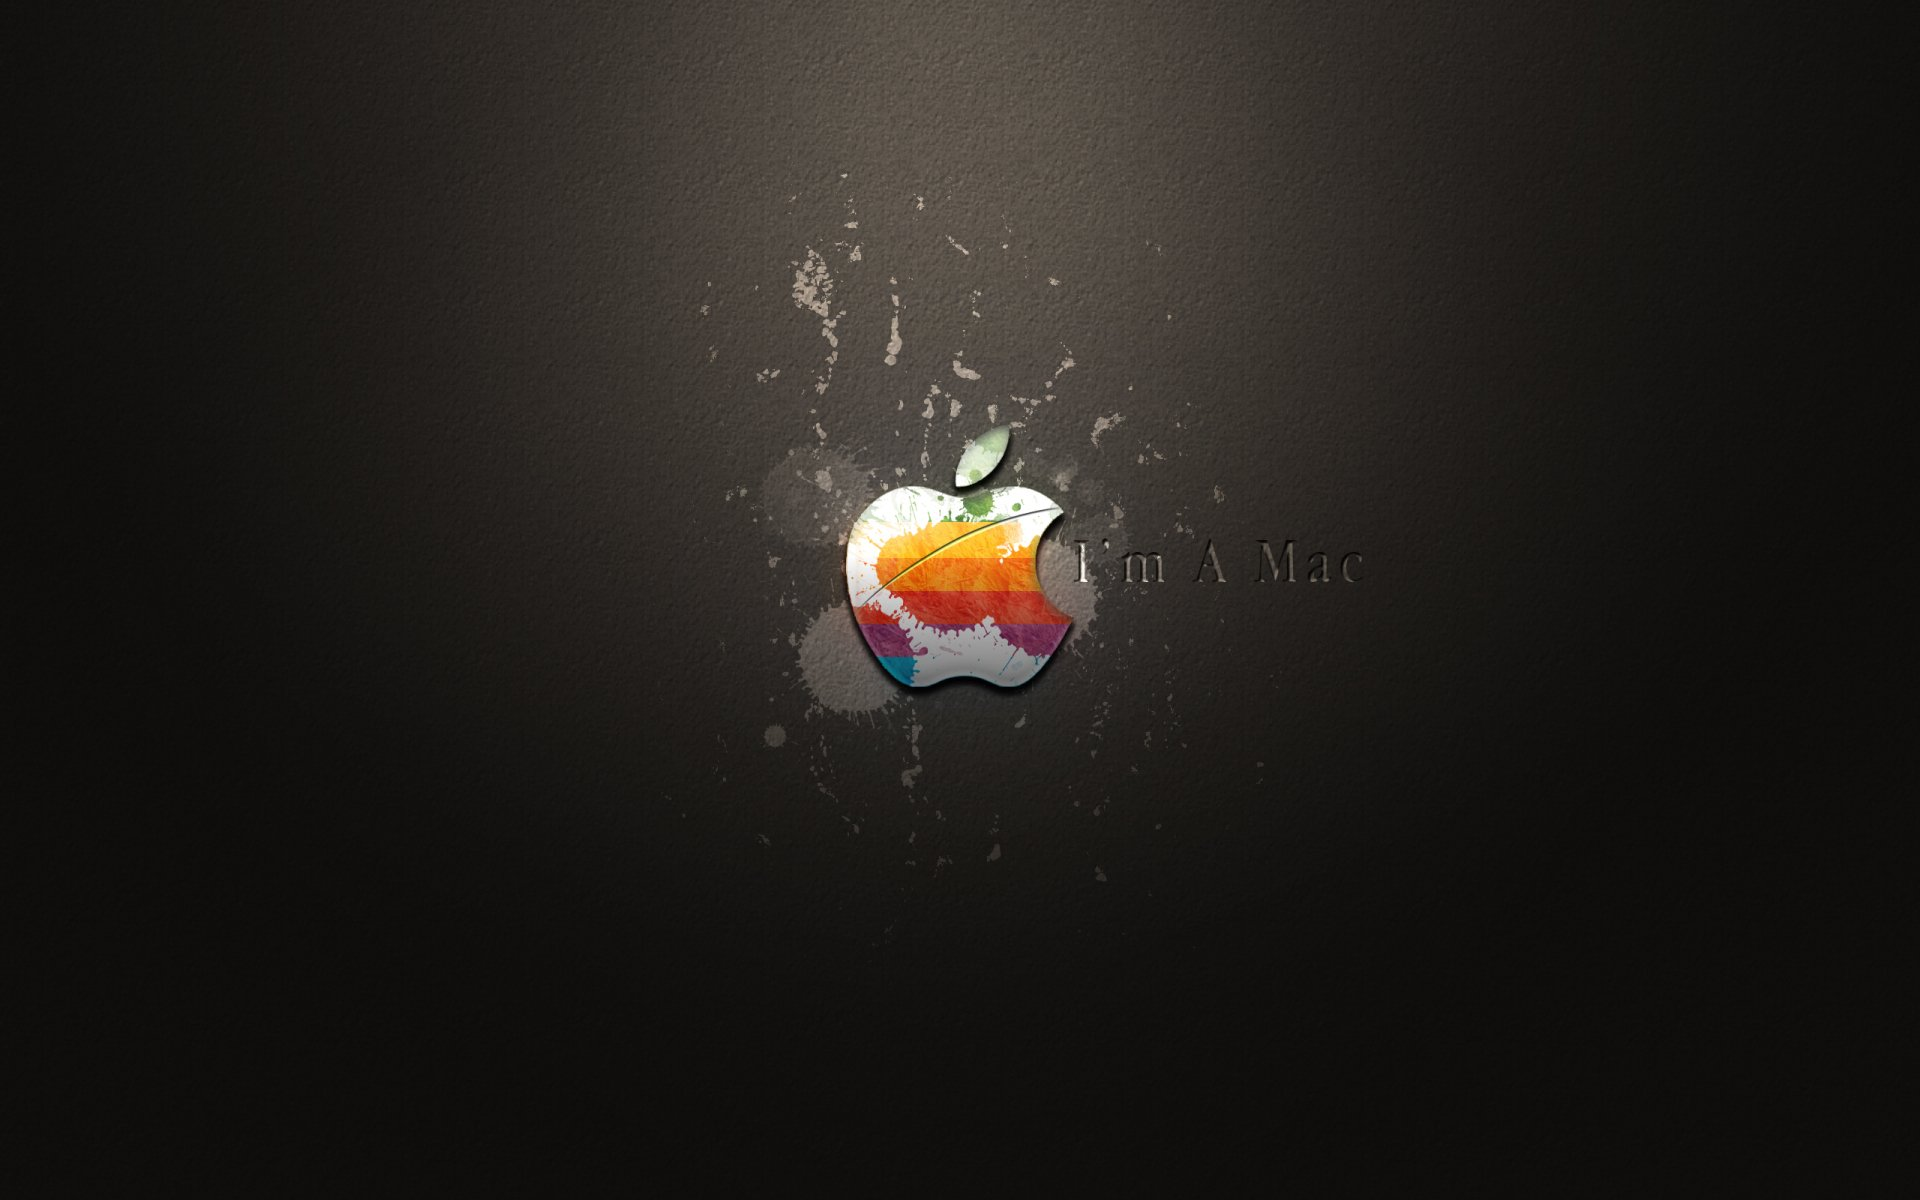 Apple full hd sfondo and sfondi 2560x1600 id 232240 for Sfondo apple hd